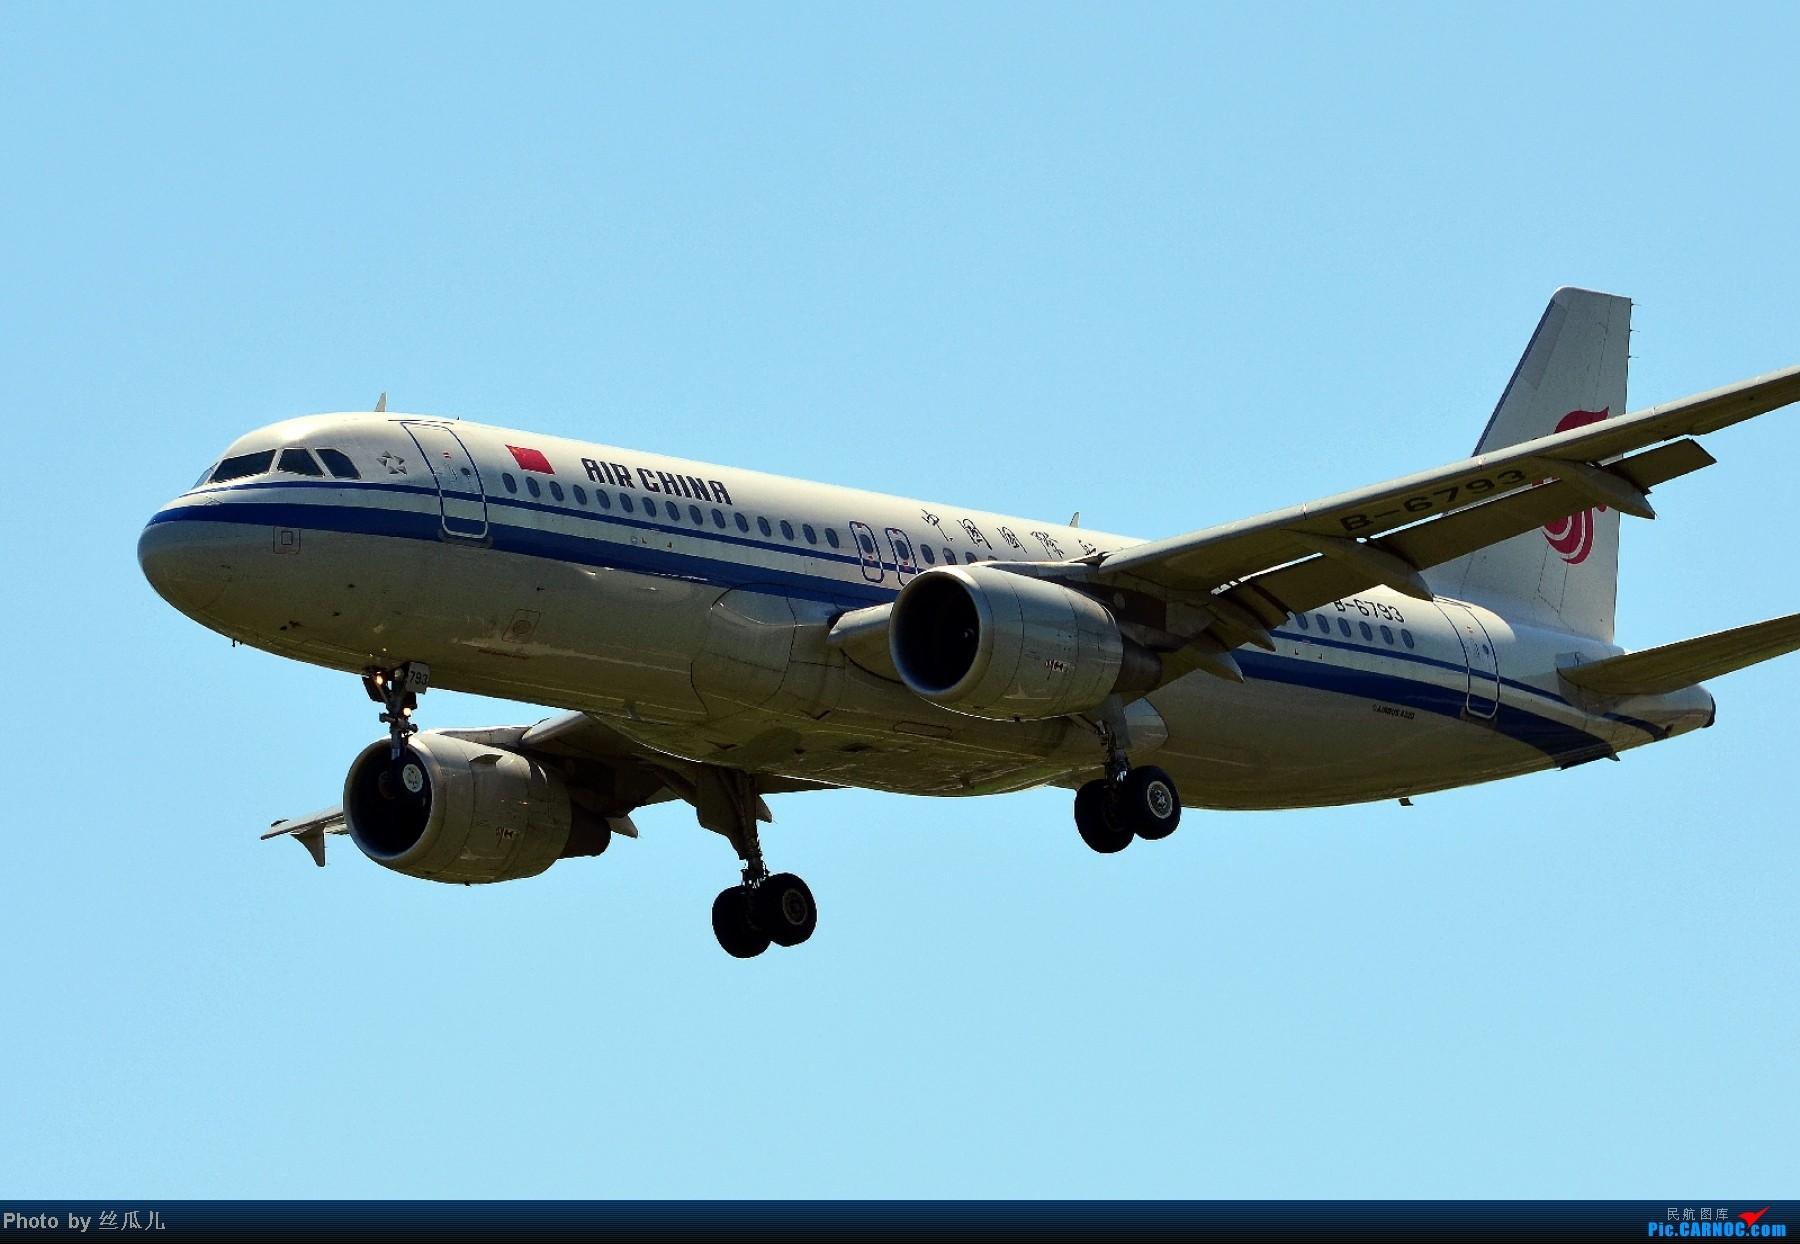 Re:[原创]长途奔袭鸟窝所得,HGH-PEK-HGH,鸟窝上空在我登基前的最后时刻云开雾散,感谢国家!感谢首都人民!感谢飞友网!感谢新华网!感谢CCTV!! AIRBUS A320-200 B-6793 中国北京首都机场